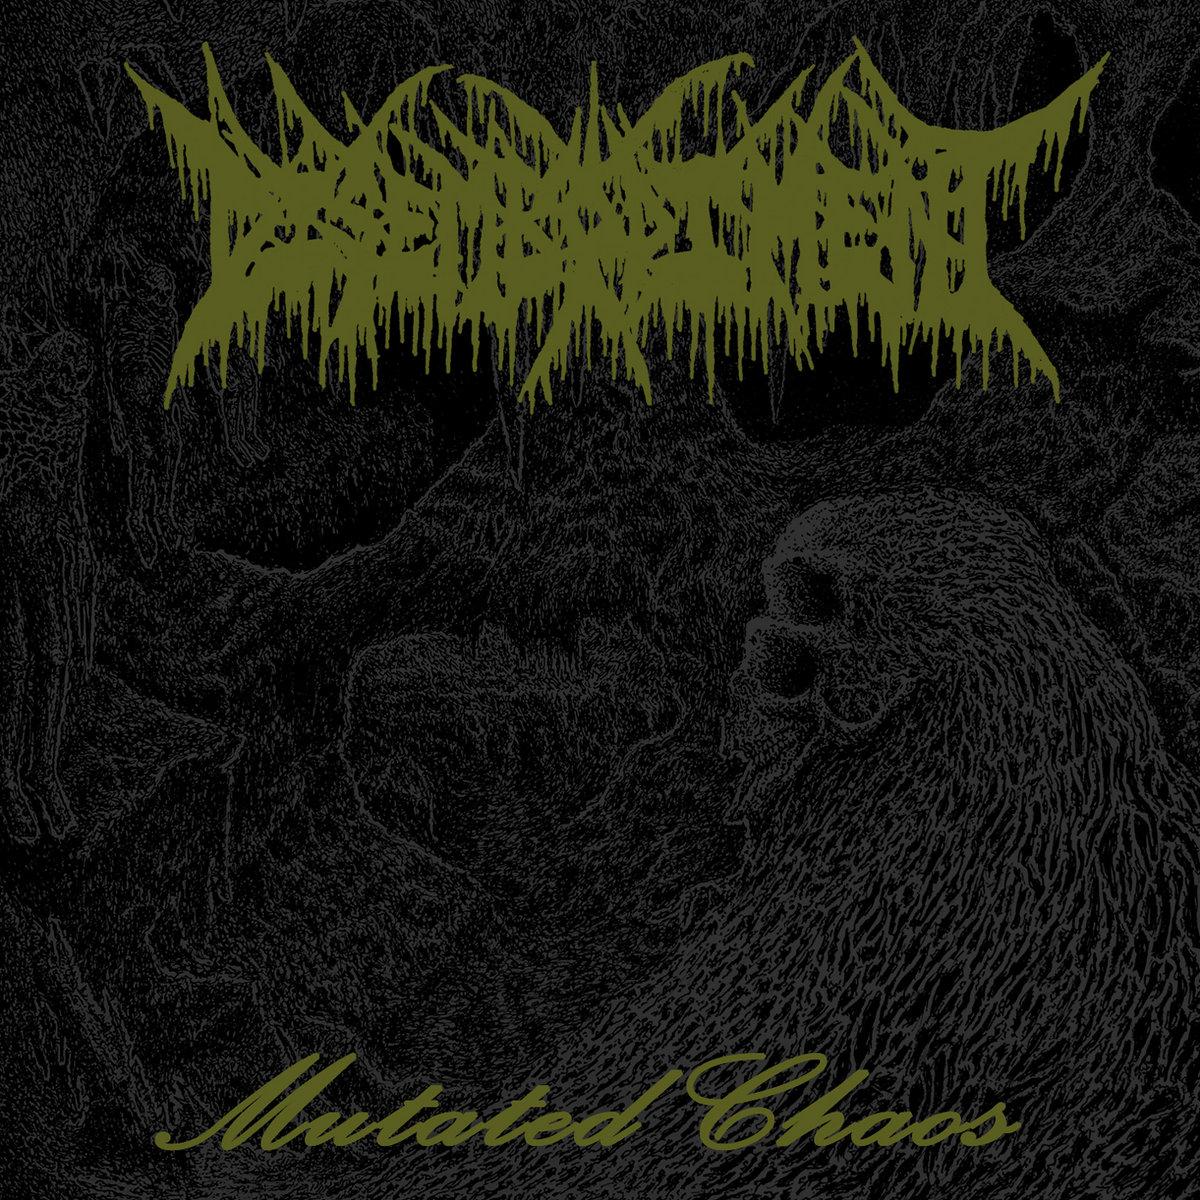 Disembodiment Mutated Chaos Album Cover Artwork